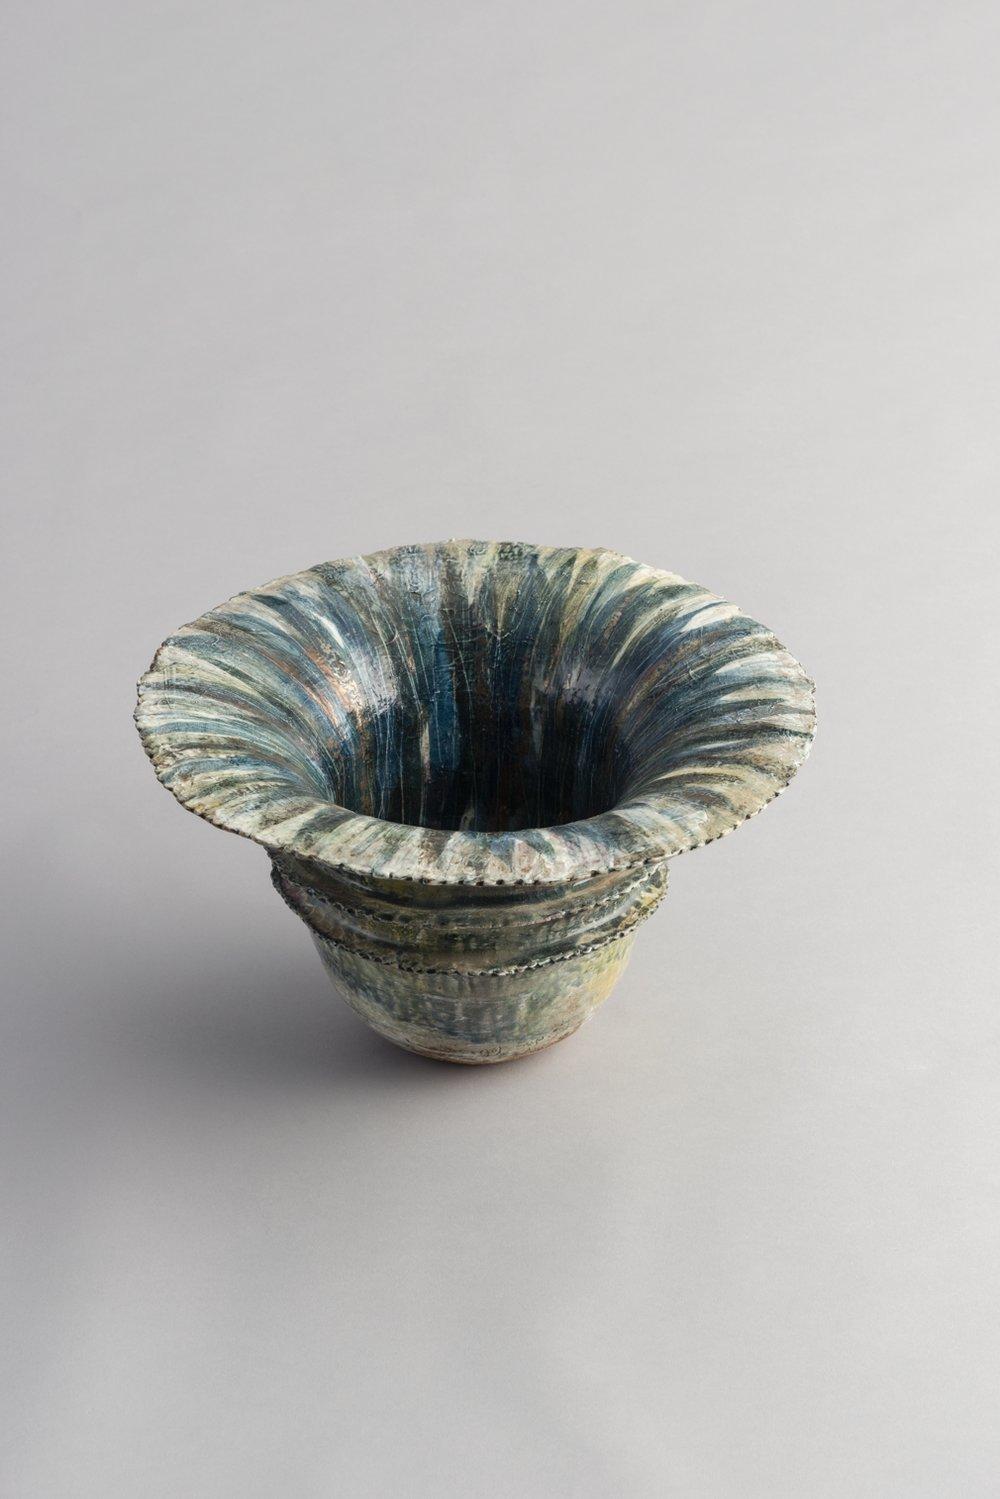 Gold-Silver-Glazed Vase / 染付金銀彩花器